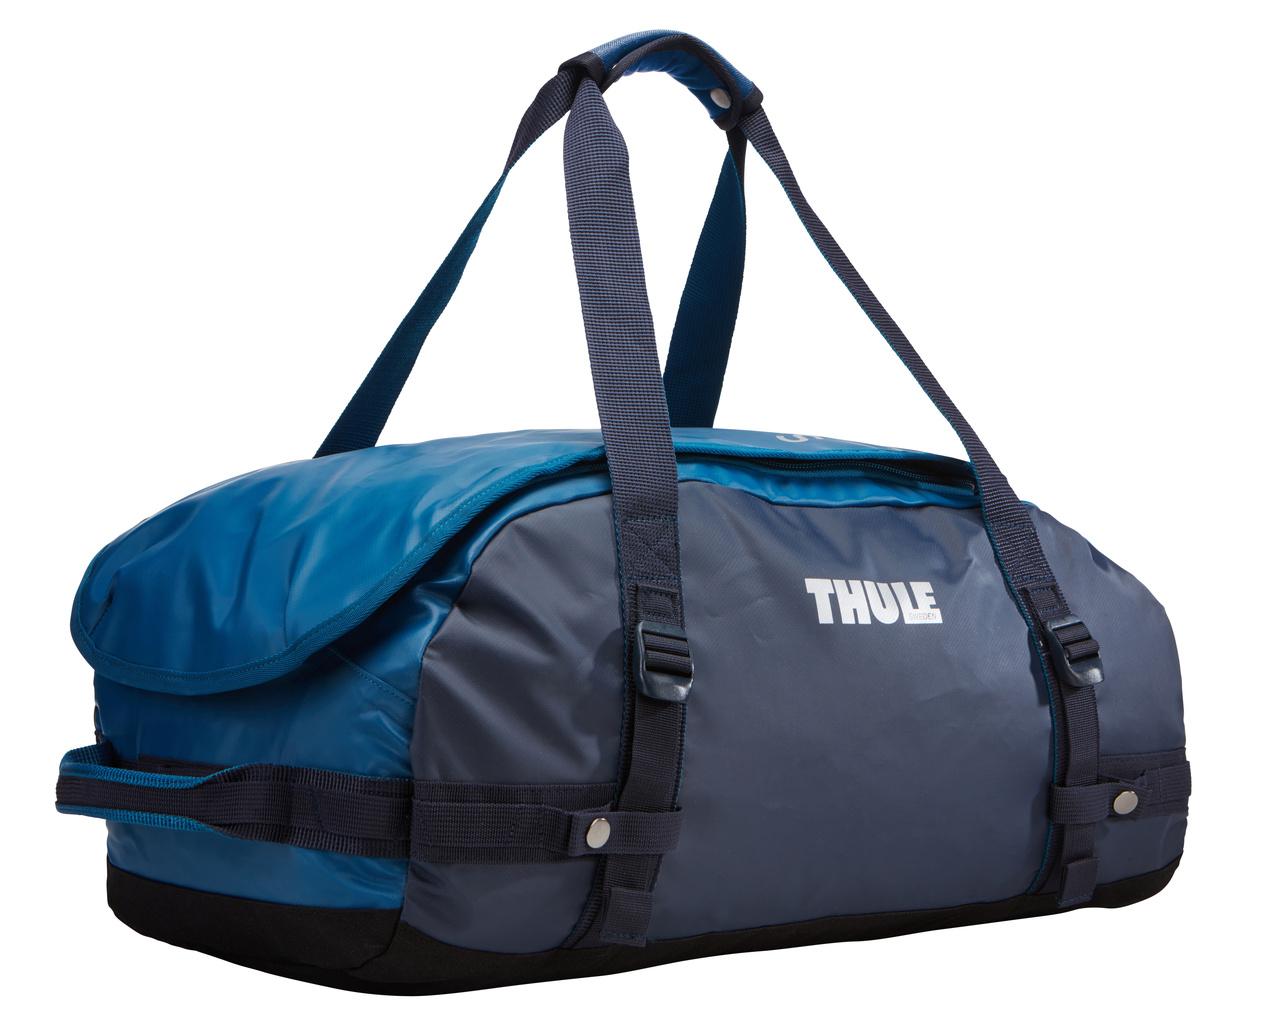 Thule Chasm Small 40L Duffelbag